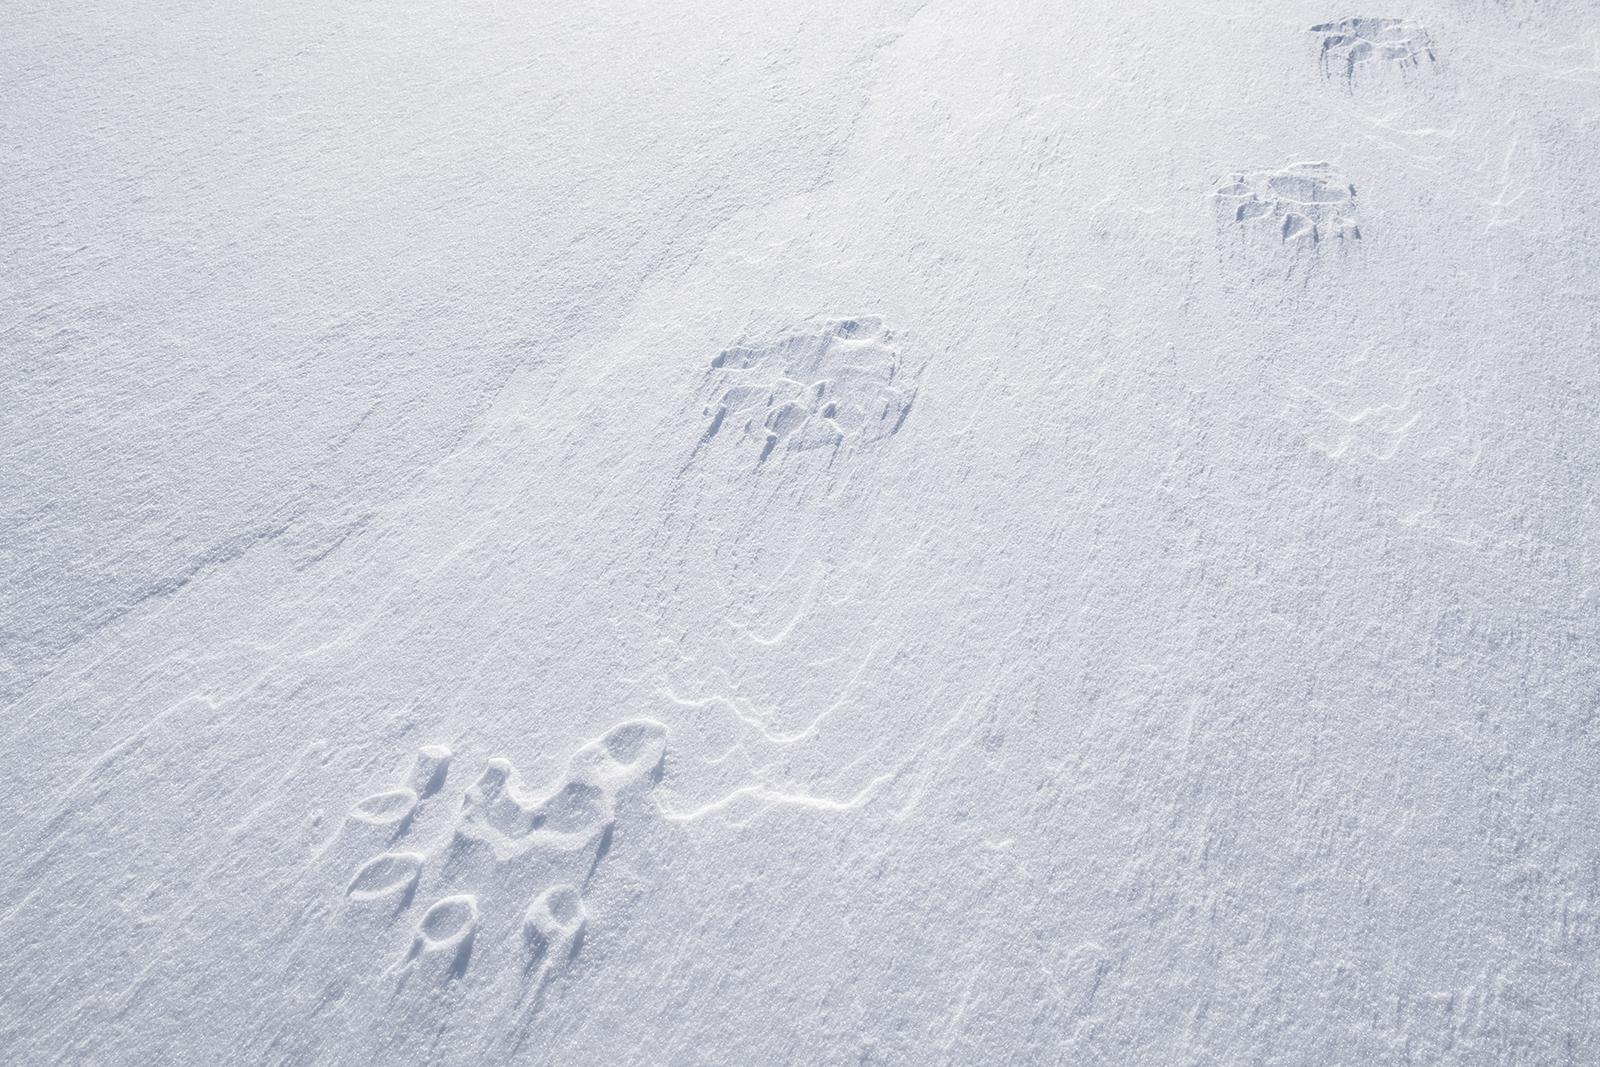 Wolverine paw-prints on fresh snow